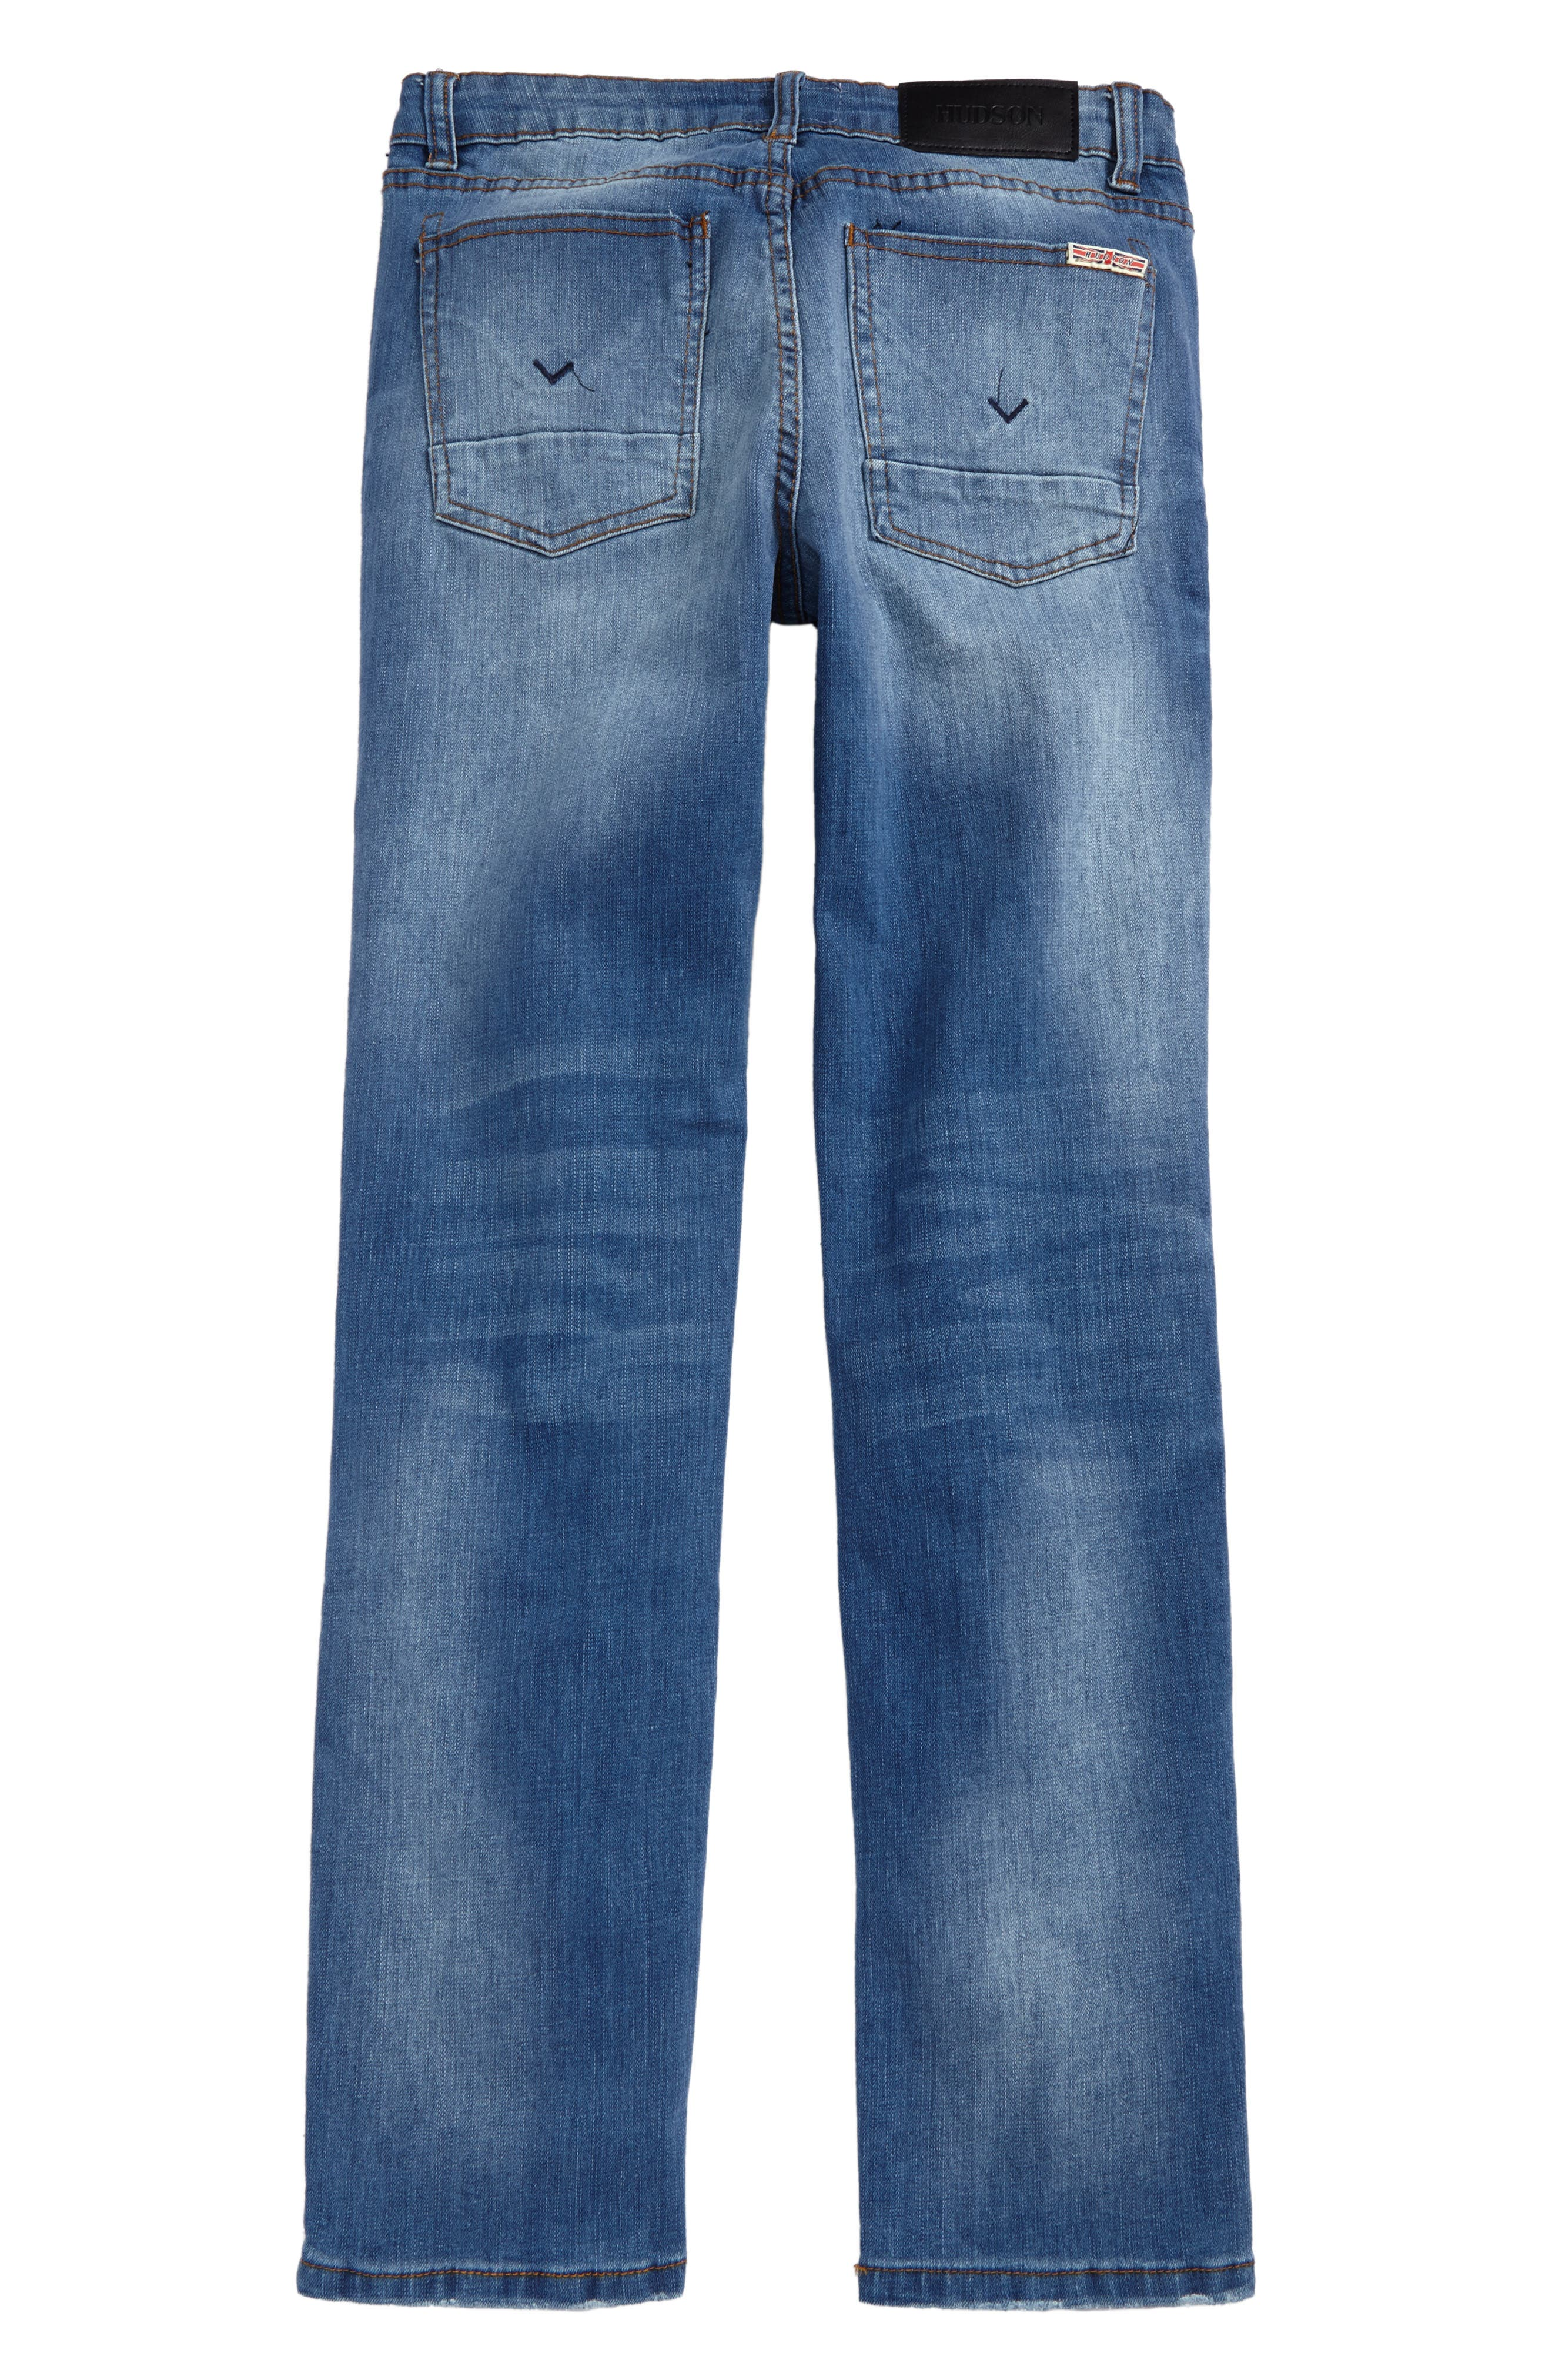 Jagger Slim Fit Straight Leg Jeans,                             Alternate thumbnail 2, color,                             Zenith